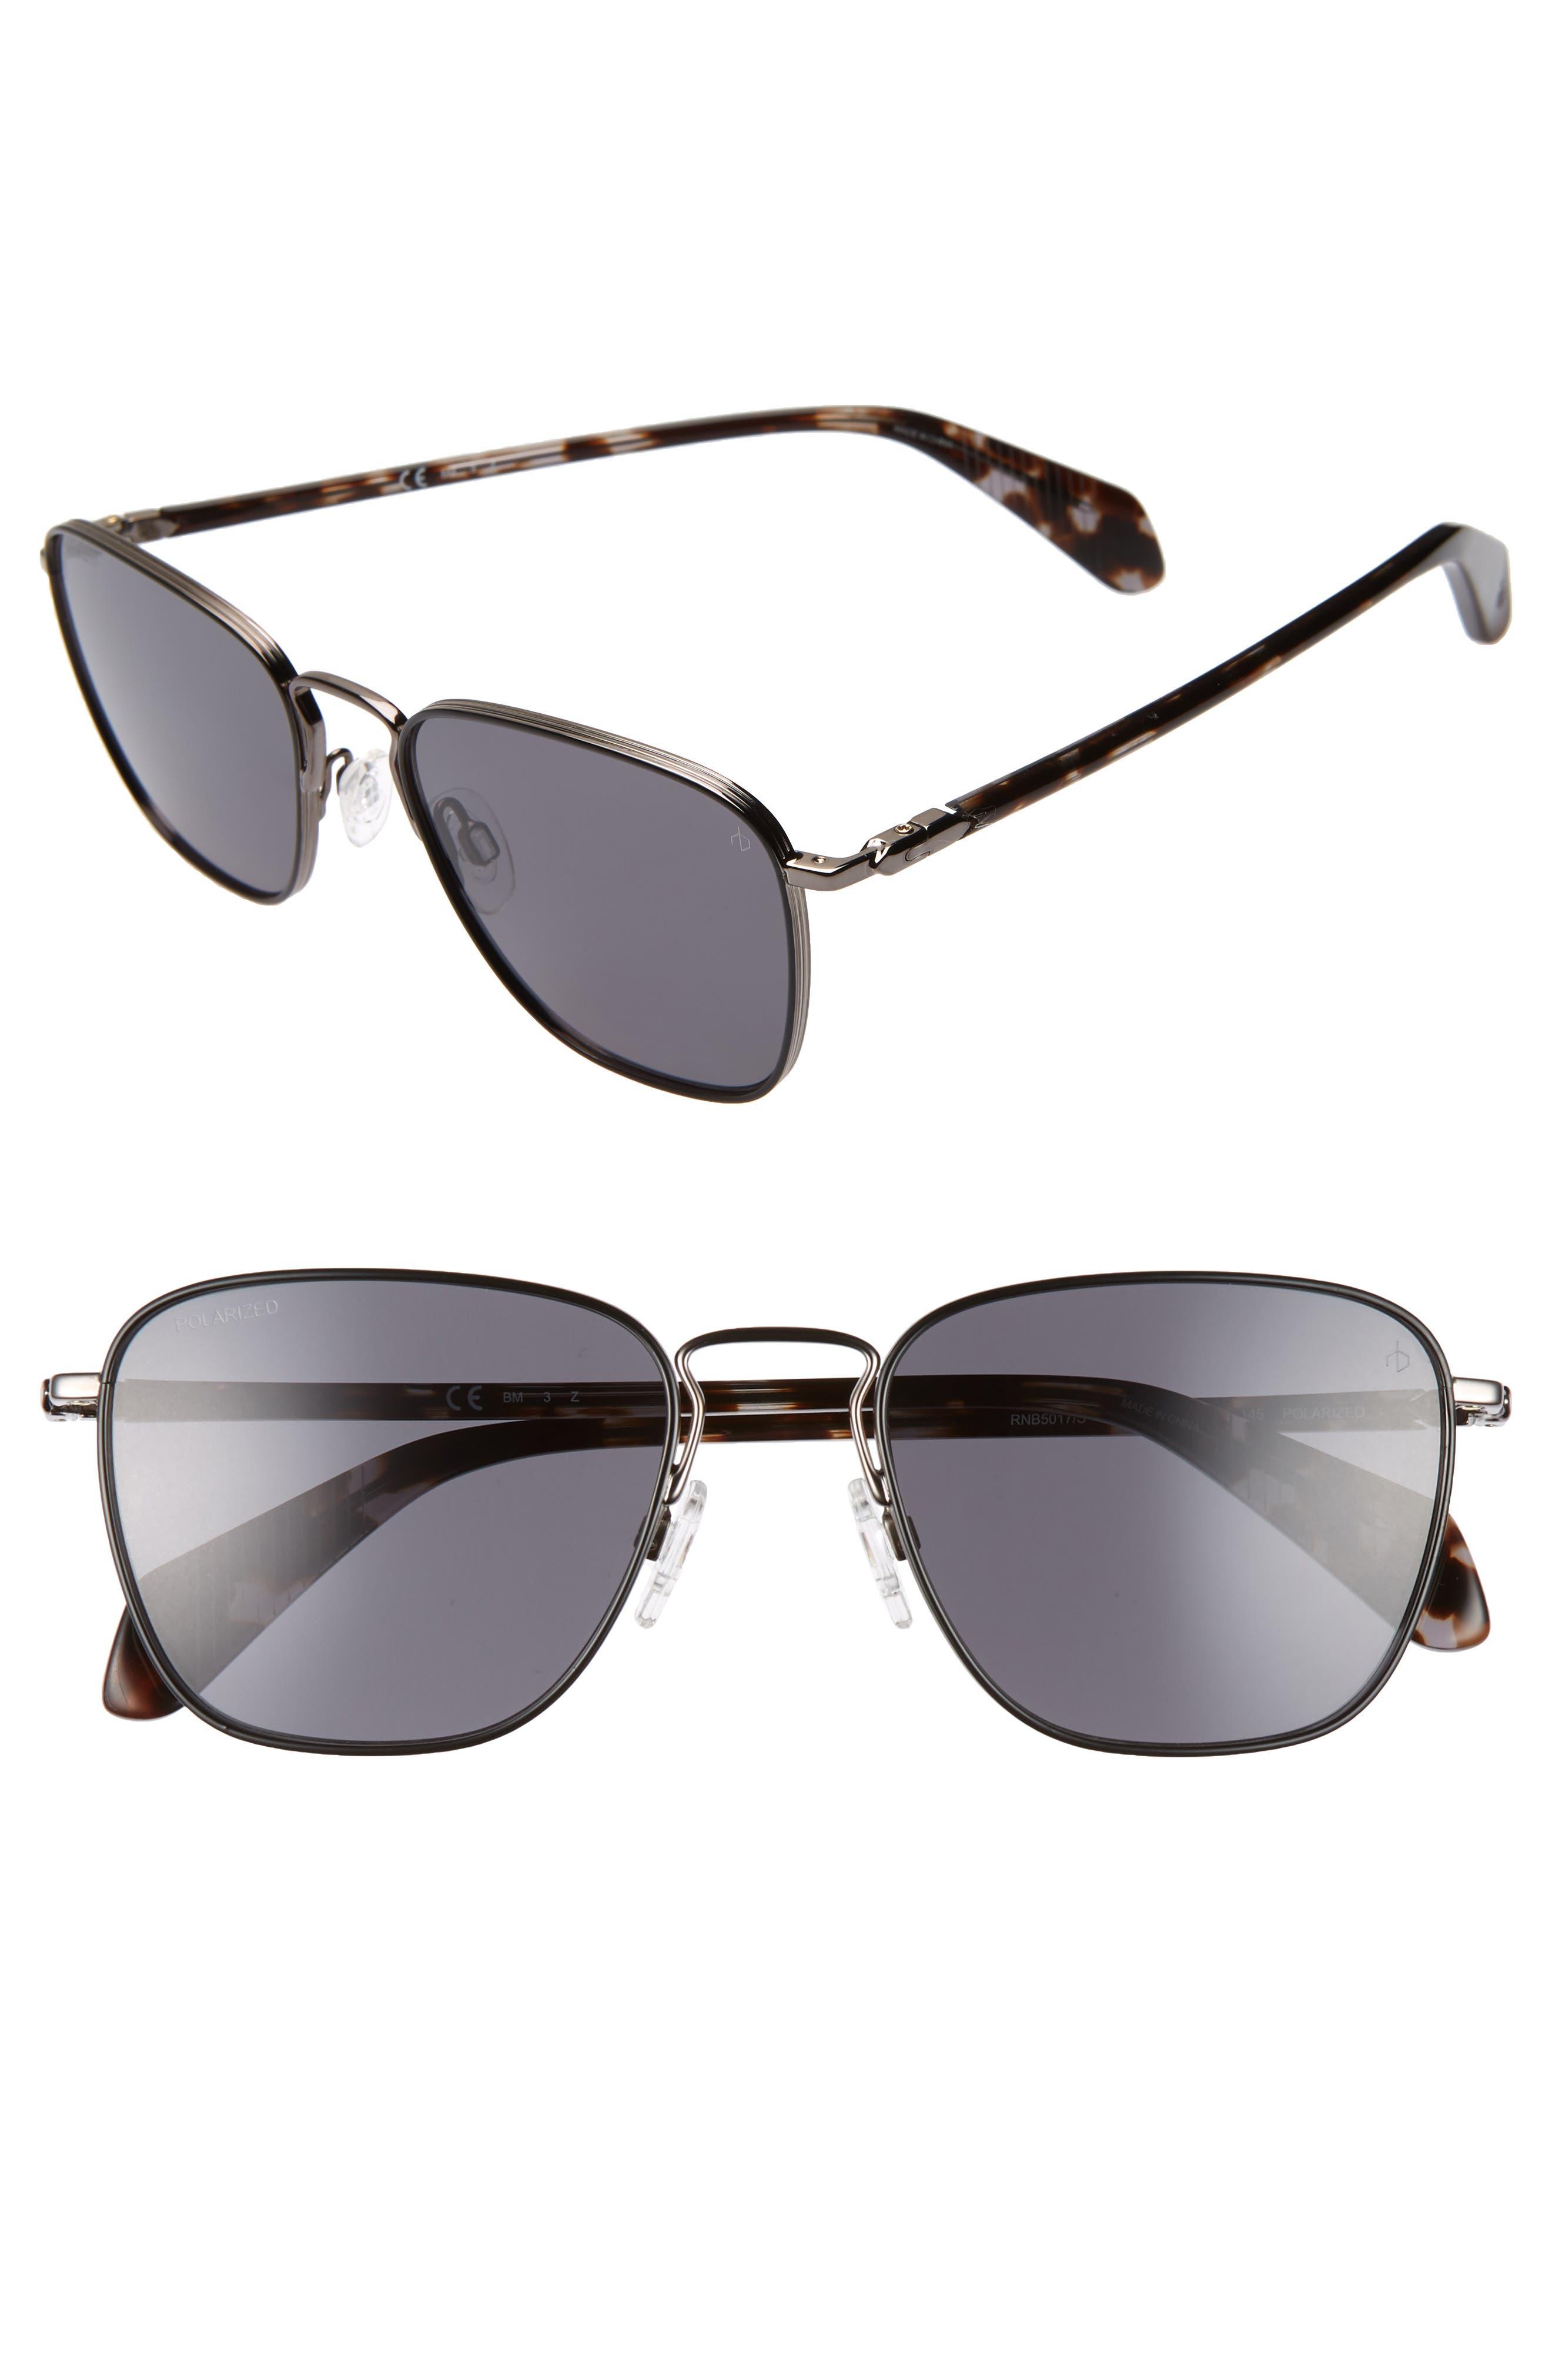 54mm Polarized Aviator Sunglasses,                             Main thumbnail 1, color,                             DARK RUTHENIUM/ BLACK